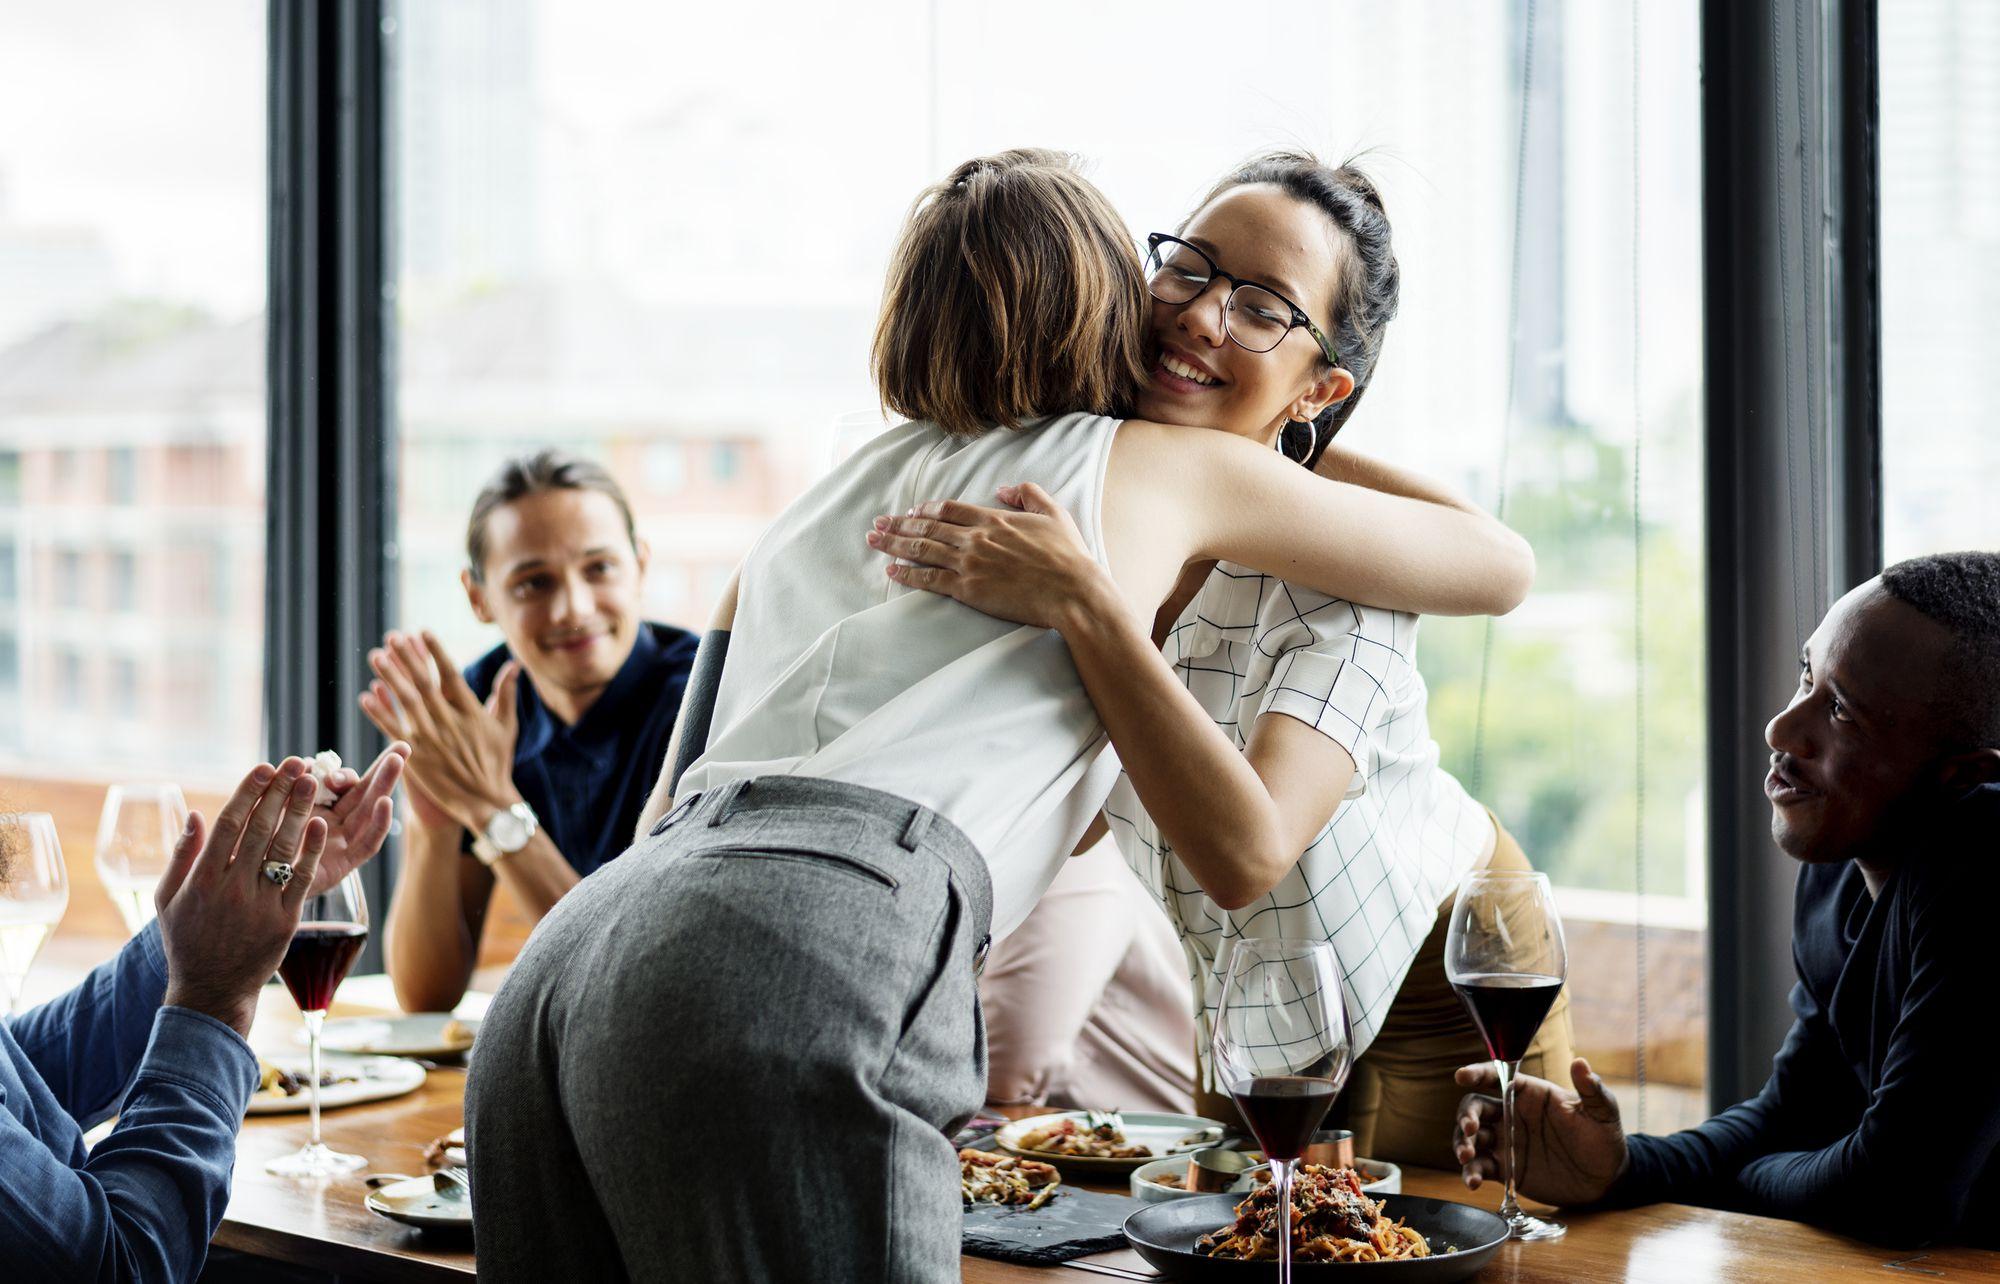 Seguro De Vida Empresarial Afinal Quais Sao Os Beneficios De Contratar Um.jpeg